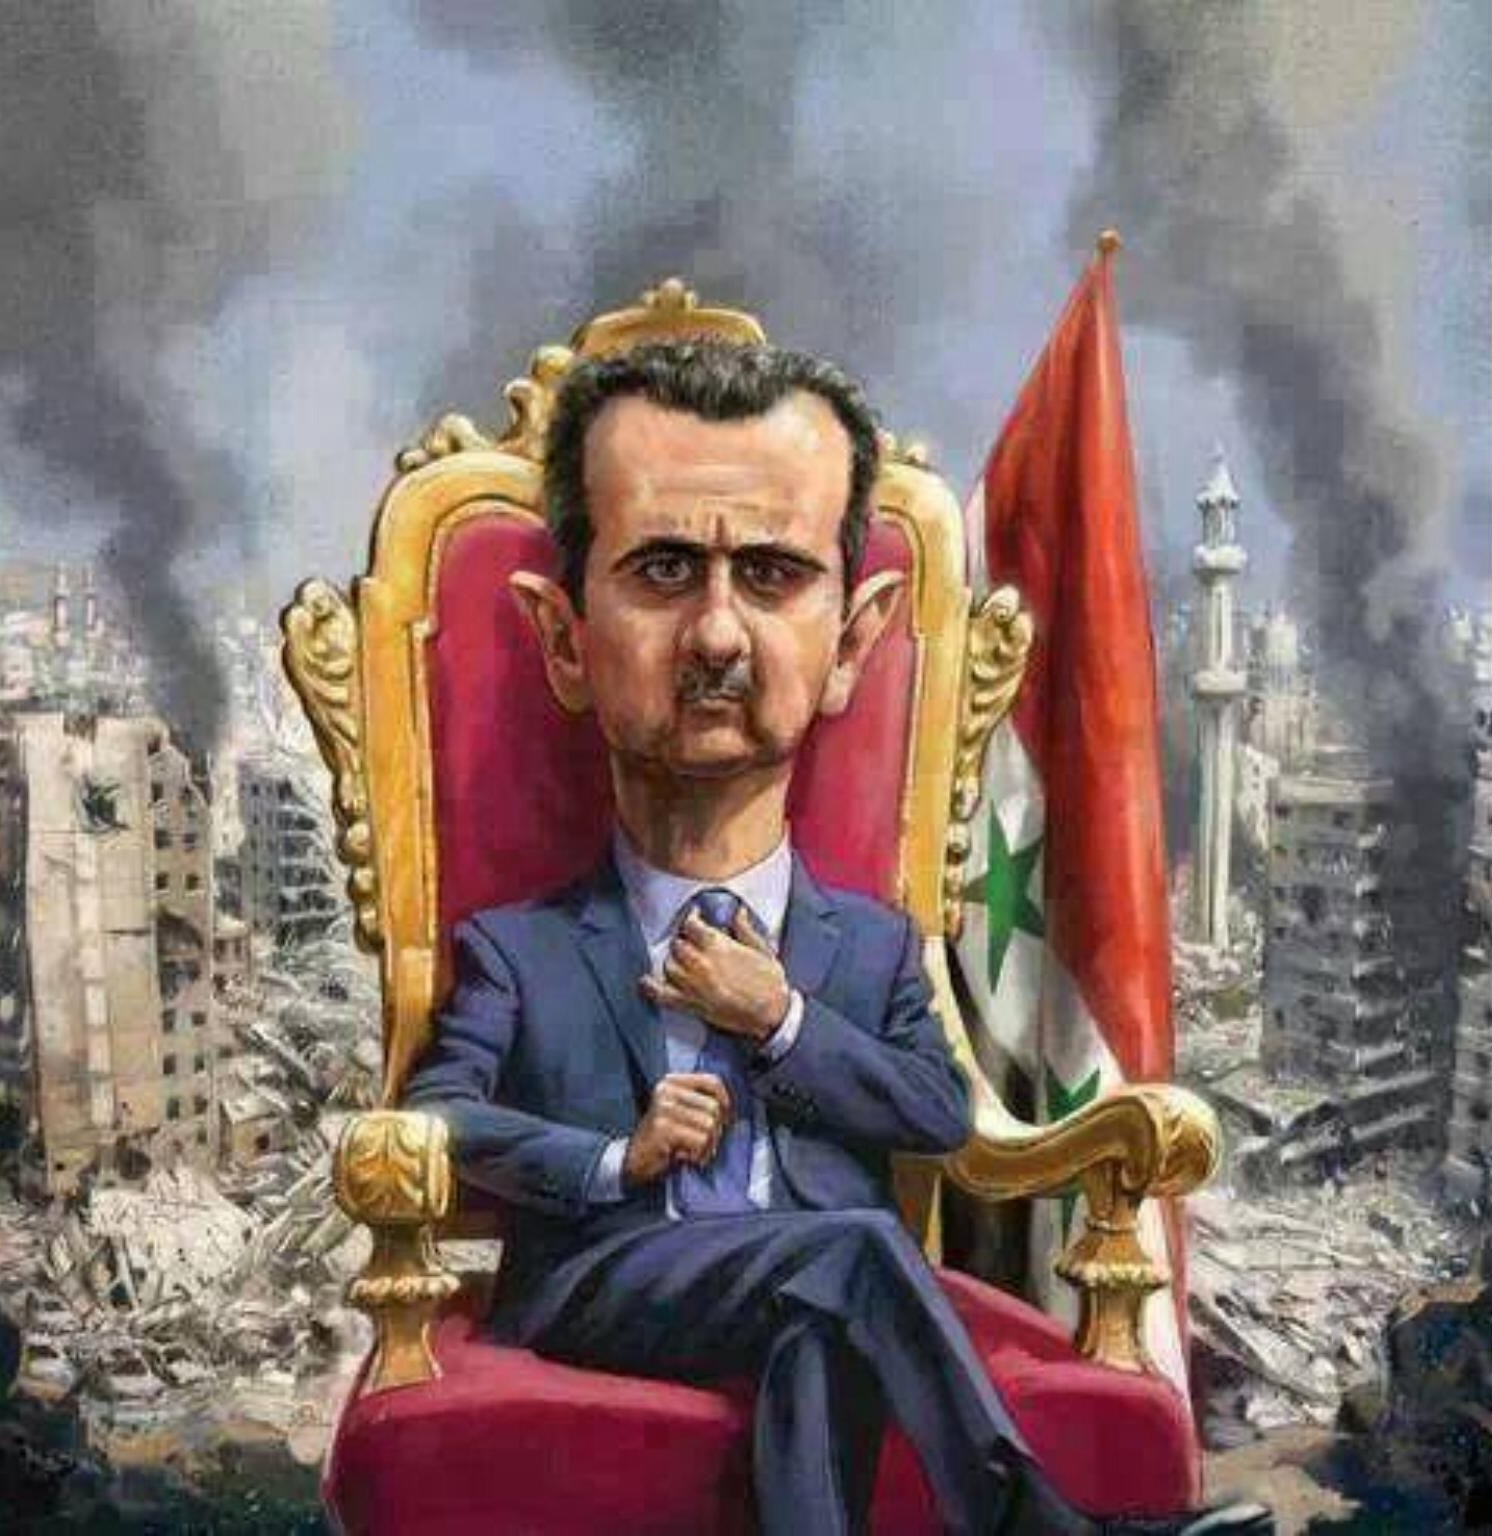 Russia grants Assad $1bn, opens trade mission in Damascus